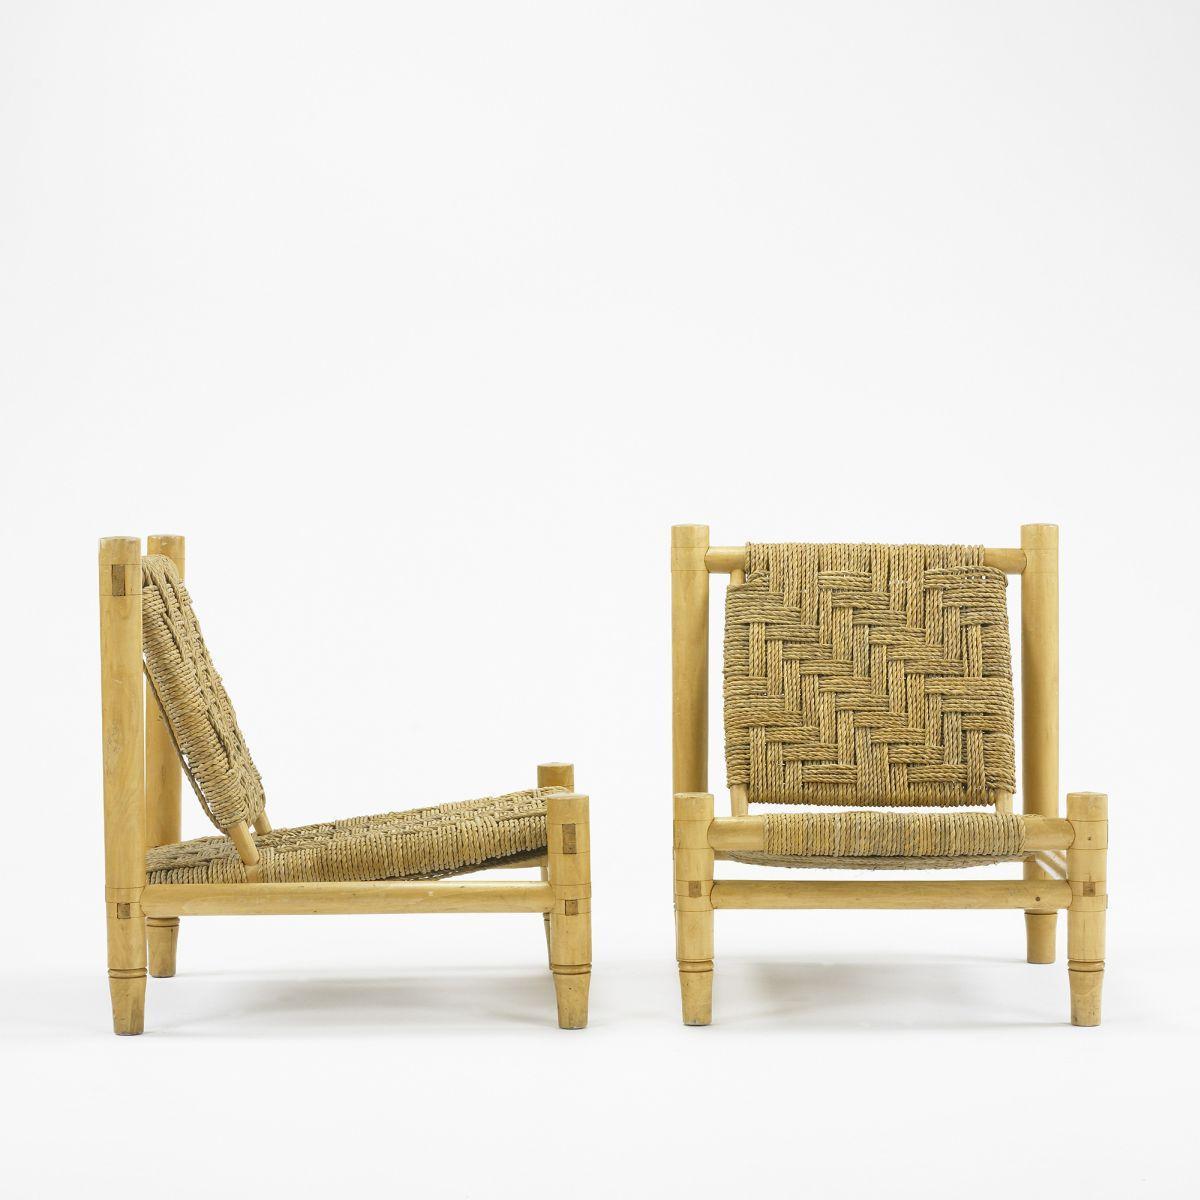 Astonishing Manner Of Charlotte Perriand Lounge Chairs Pair Inzonedesignstudio Interior Chair Design Inzonedesignstudiocom